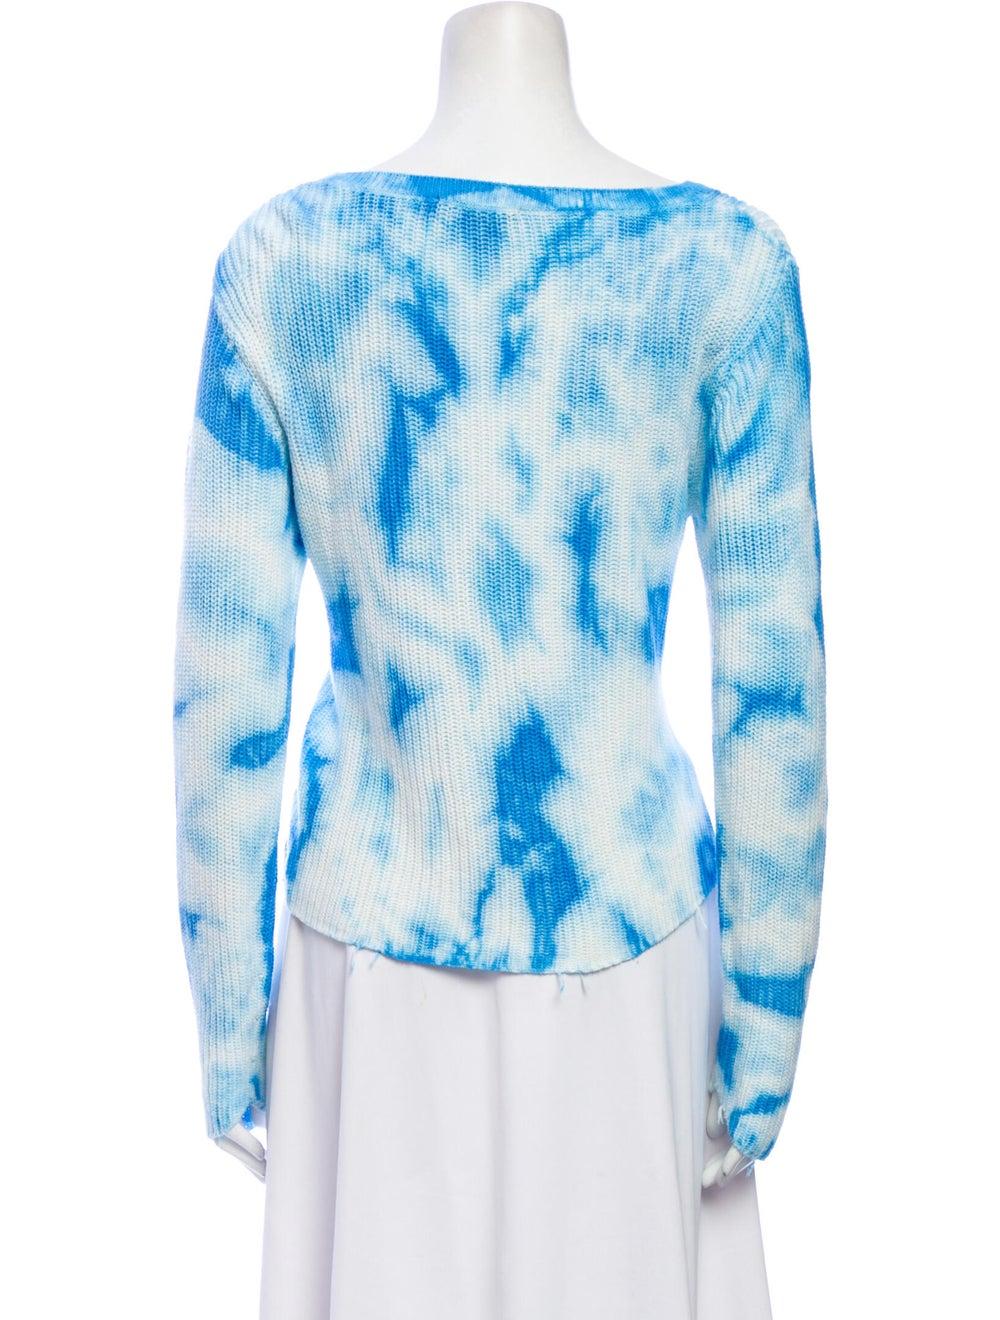 Raffi Tie-Dye Print Scoop Neck Sweater Blue - image 3